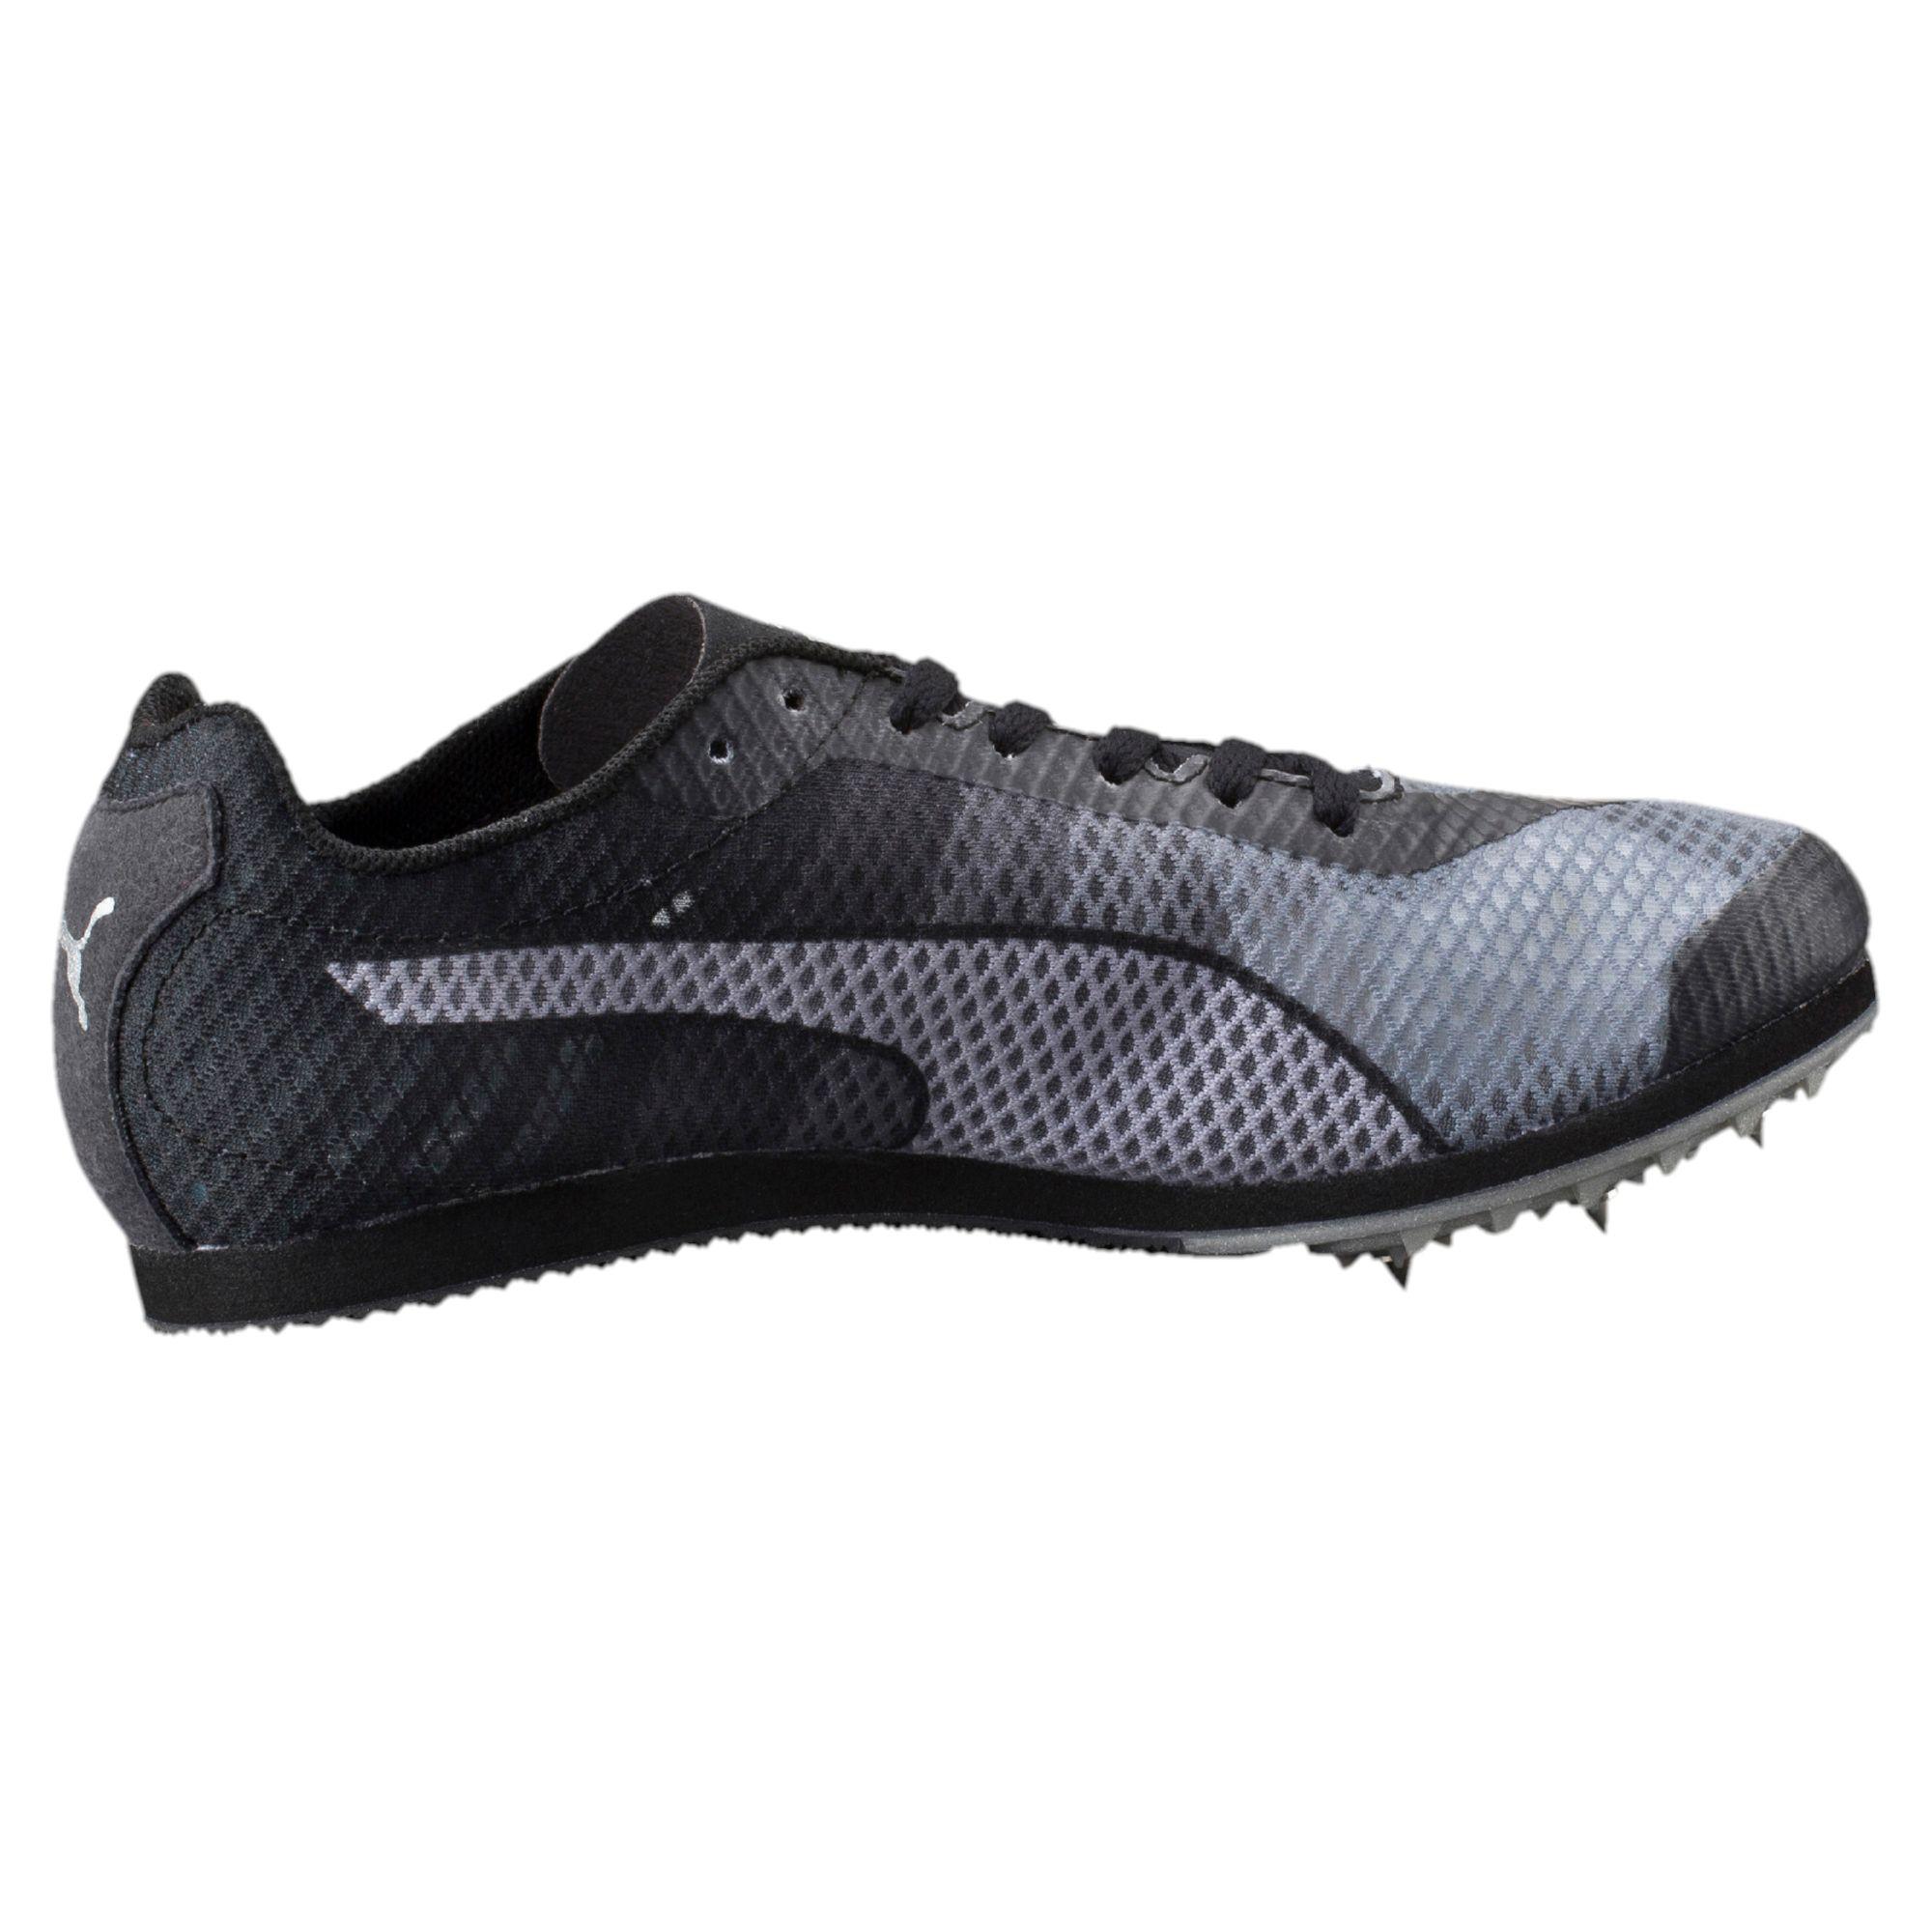 pointes evoSPEED Star v4 Junior Athlétisme Chaussures Unisexe